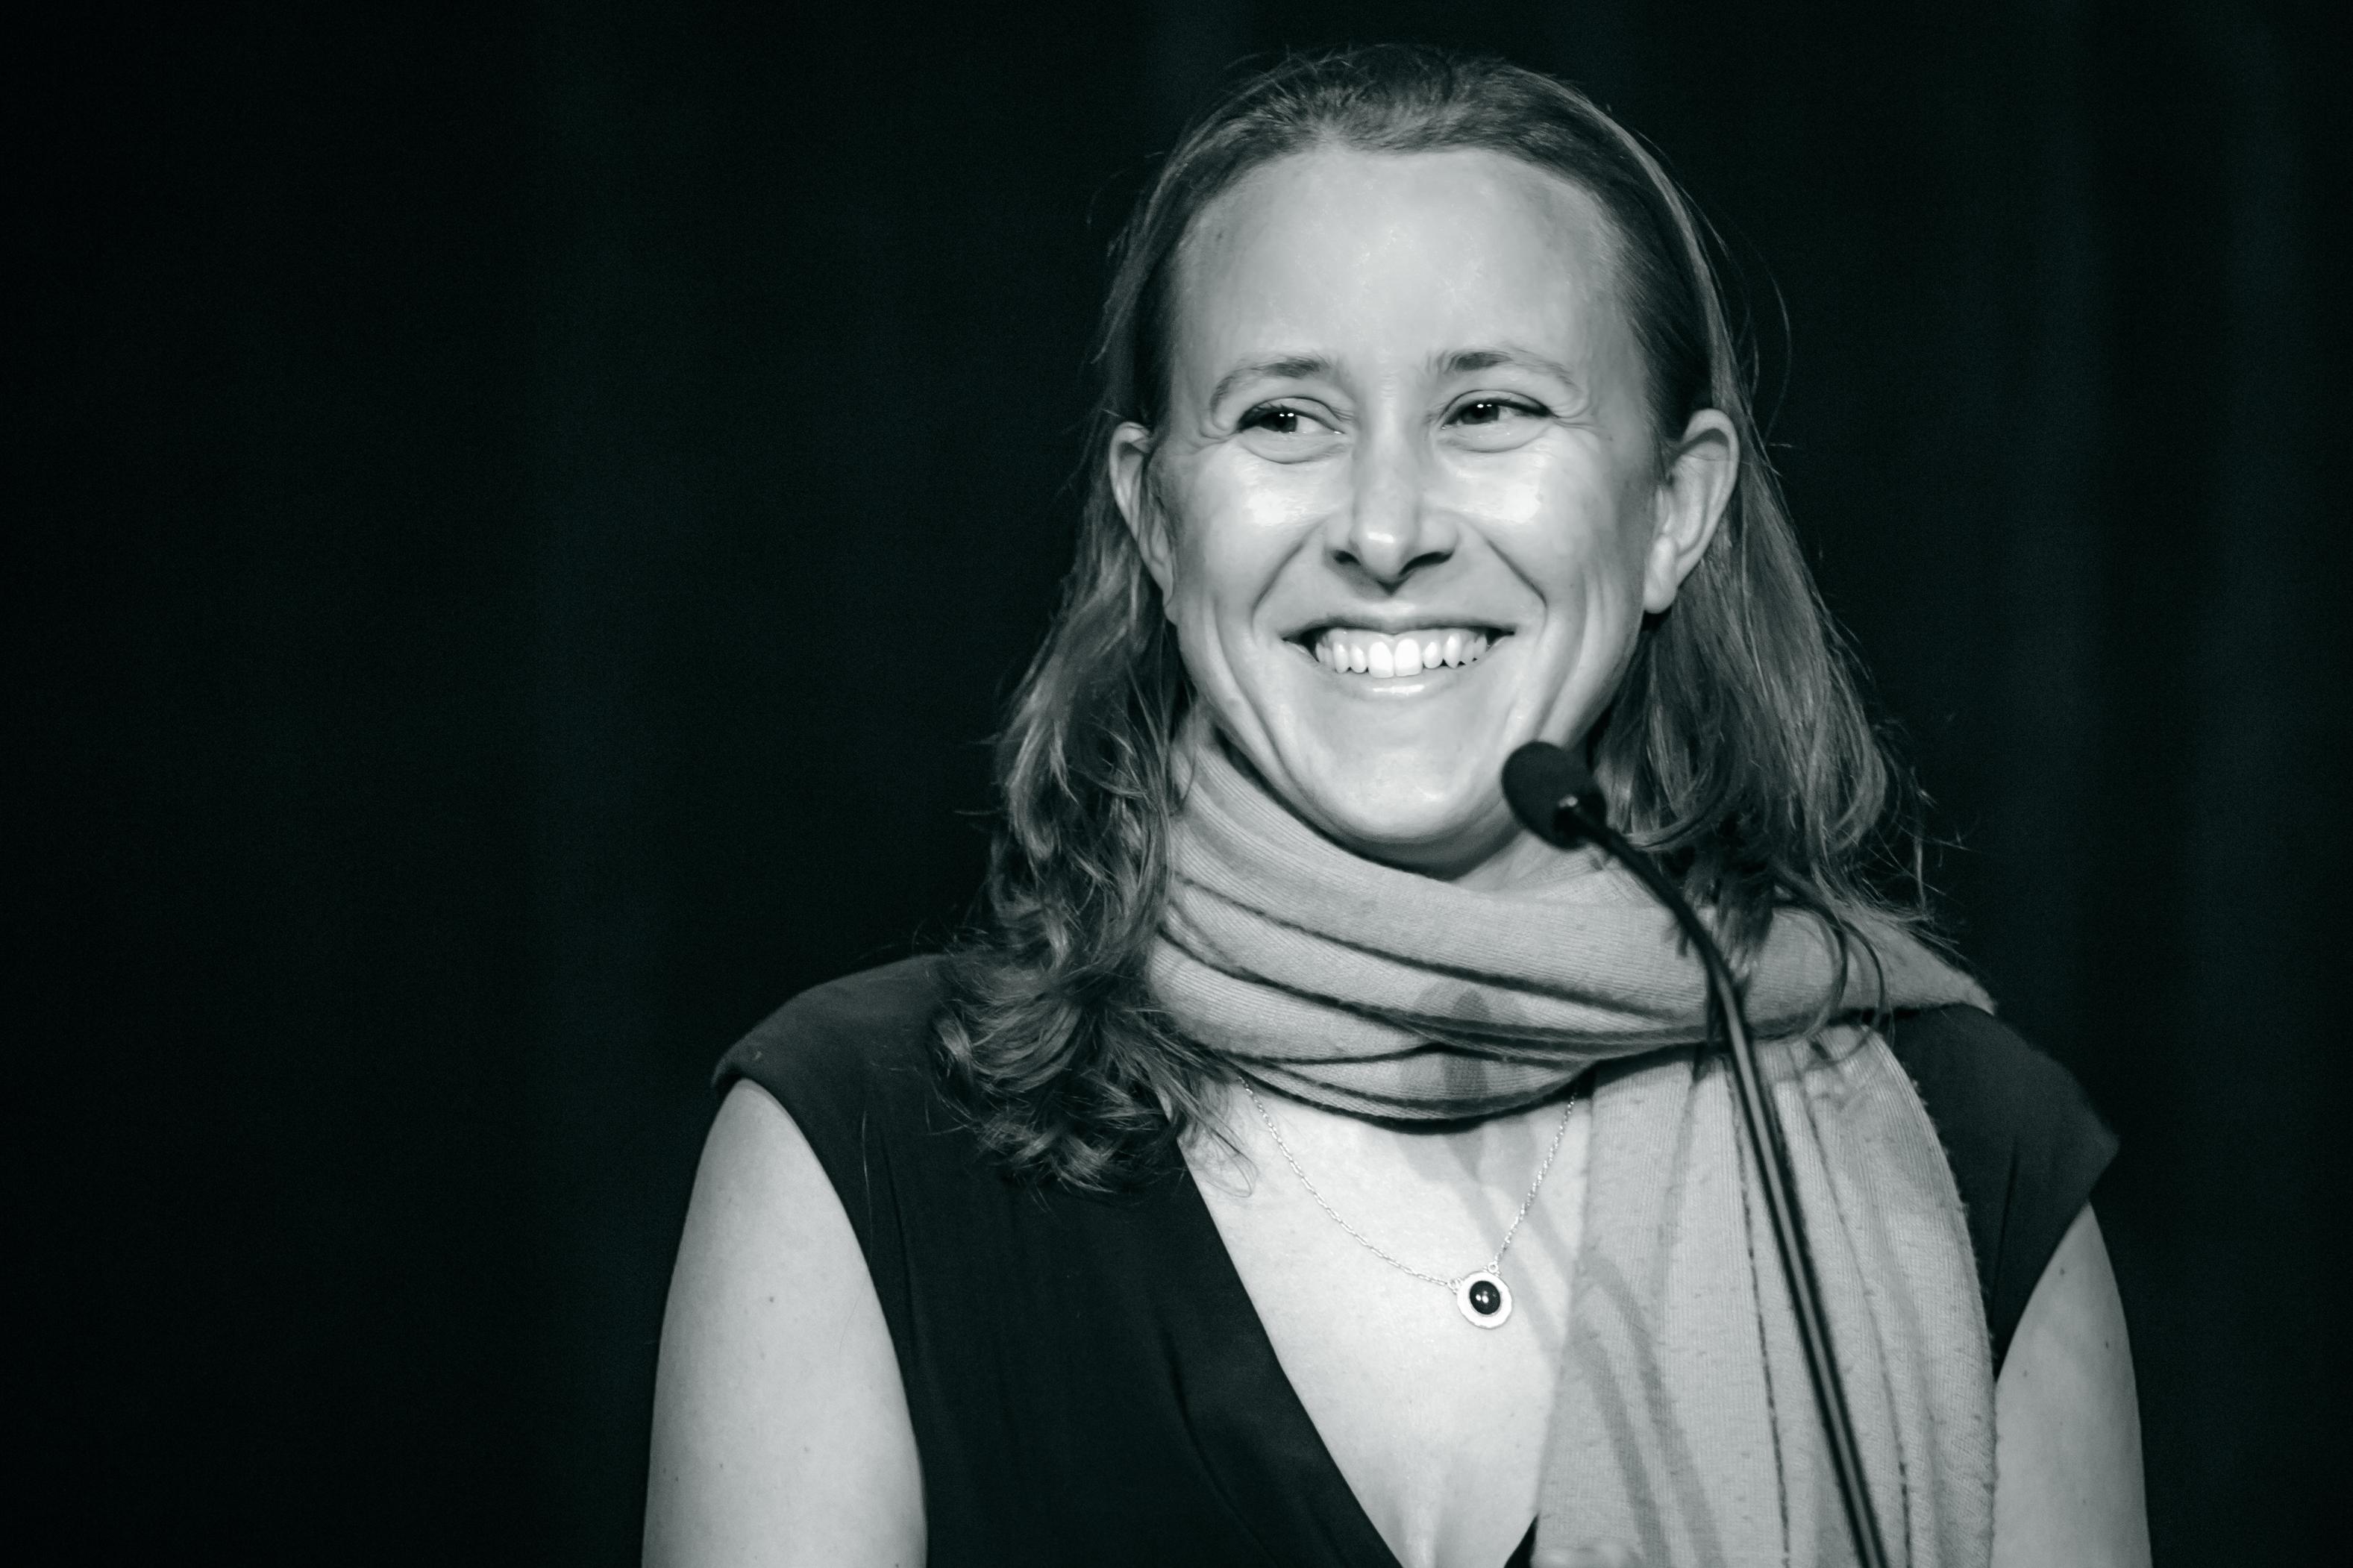 Anne Wojcicki, co-fondatrice di               23andMe, 5 aprile 2012. Credit:Thomas Hawk / Flickr. Licenza: CC BY-NC 2.0.